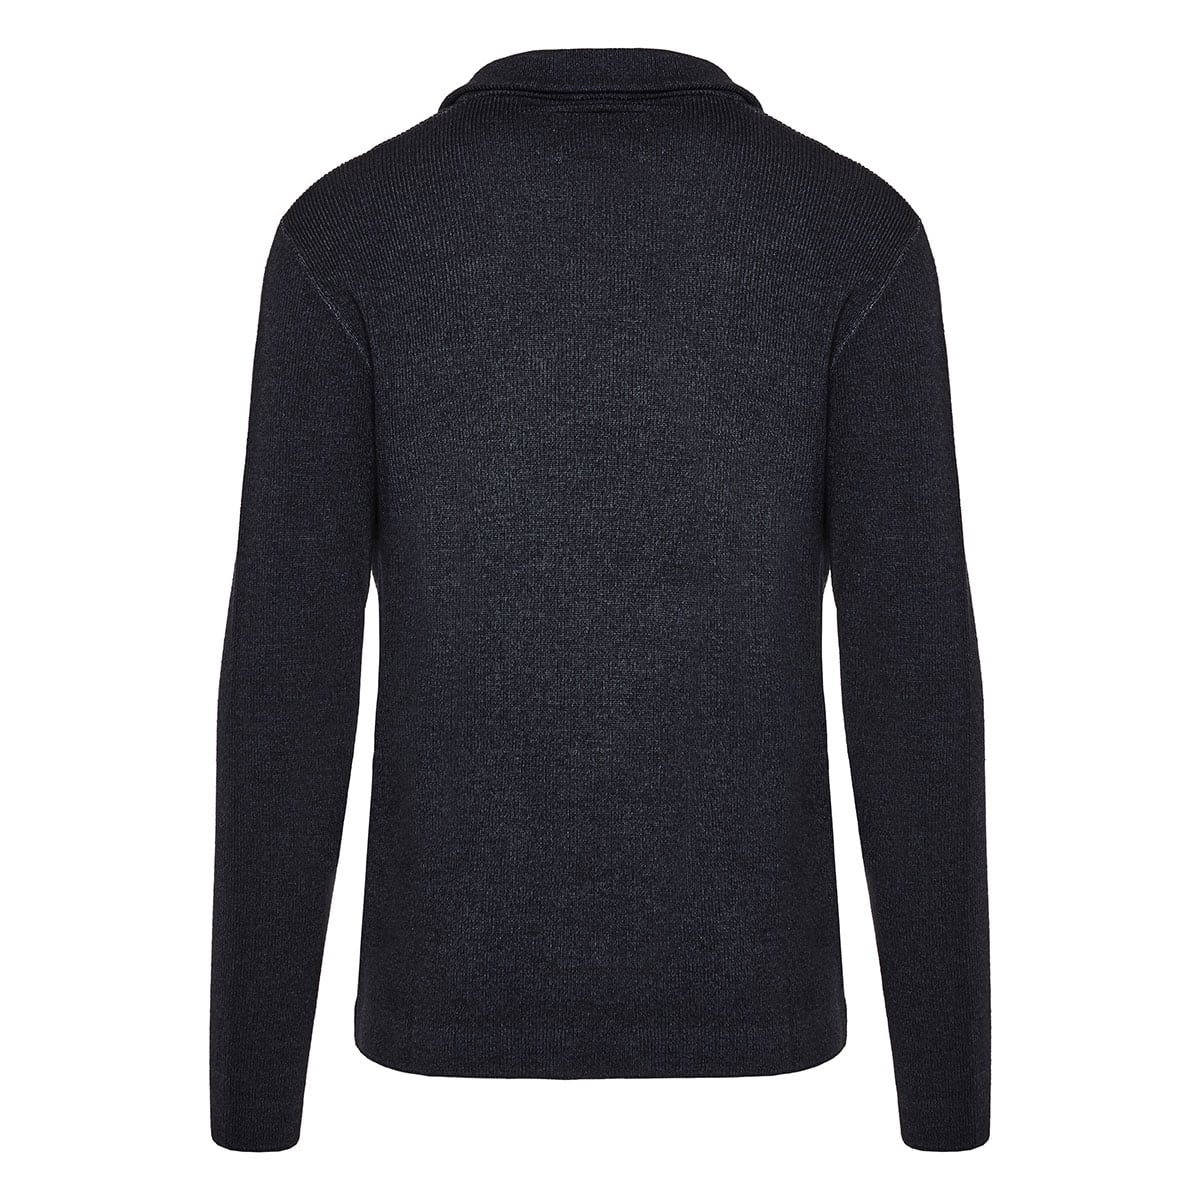 Blazer-style wool cardigan